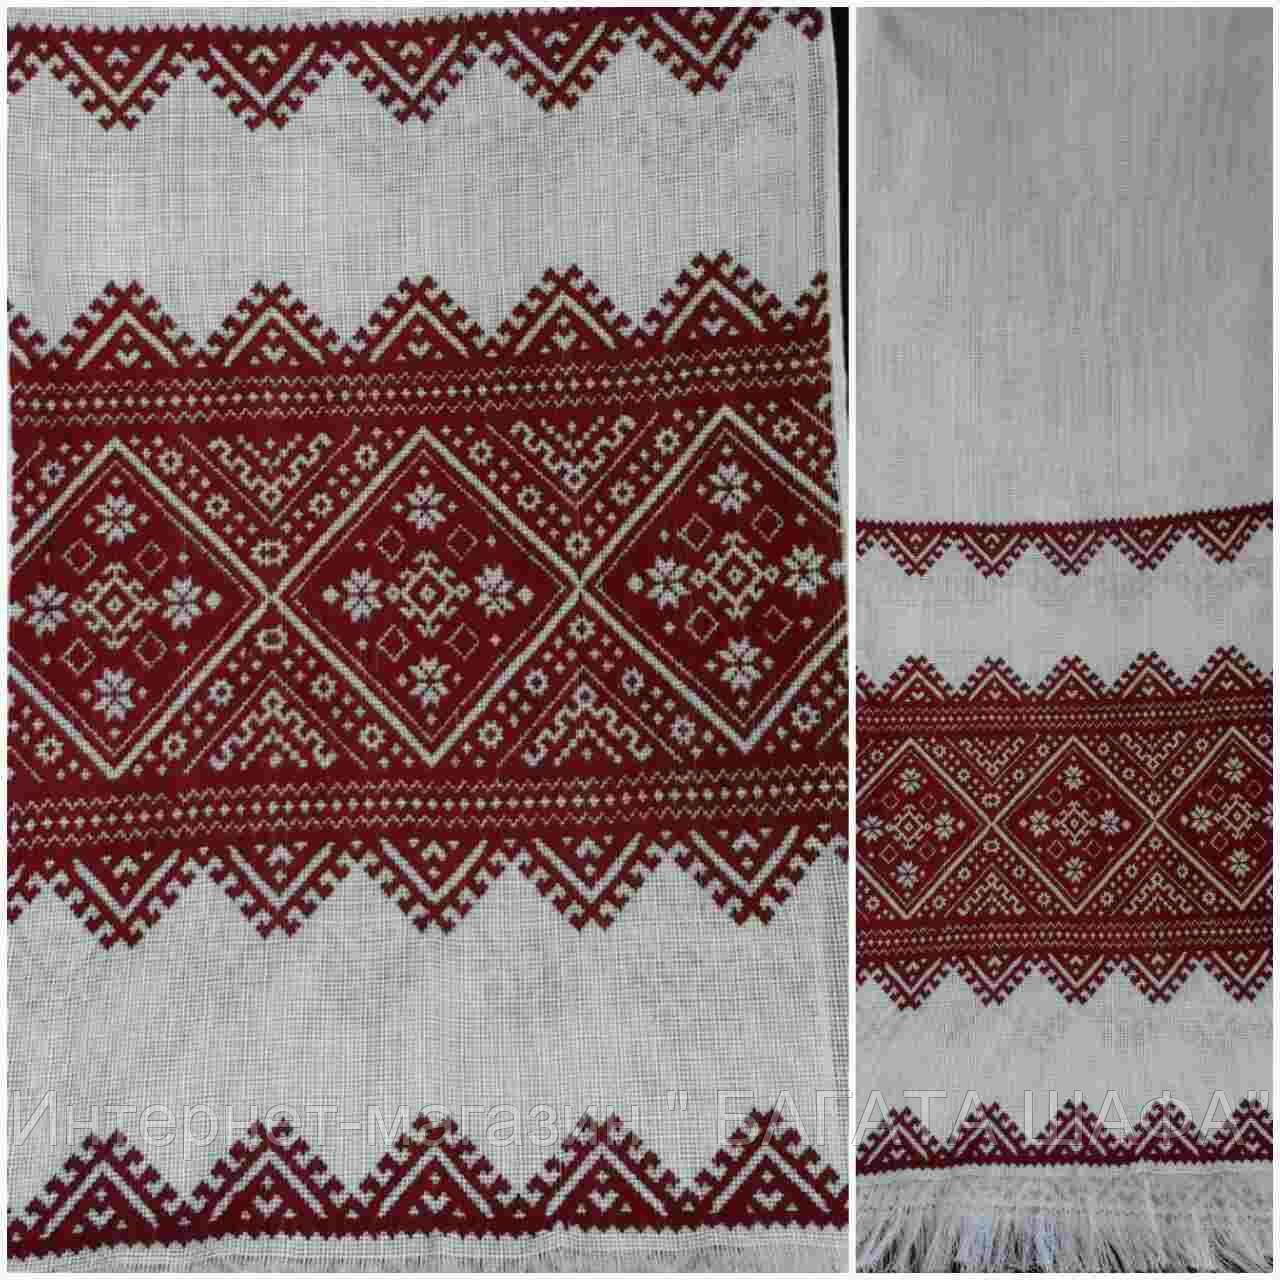 Свадебный рушник на канве, ручная работа, 180х33 см., 330/280 (цена за 1 шт. + 50 гр.), фото 1